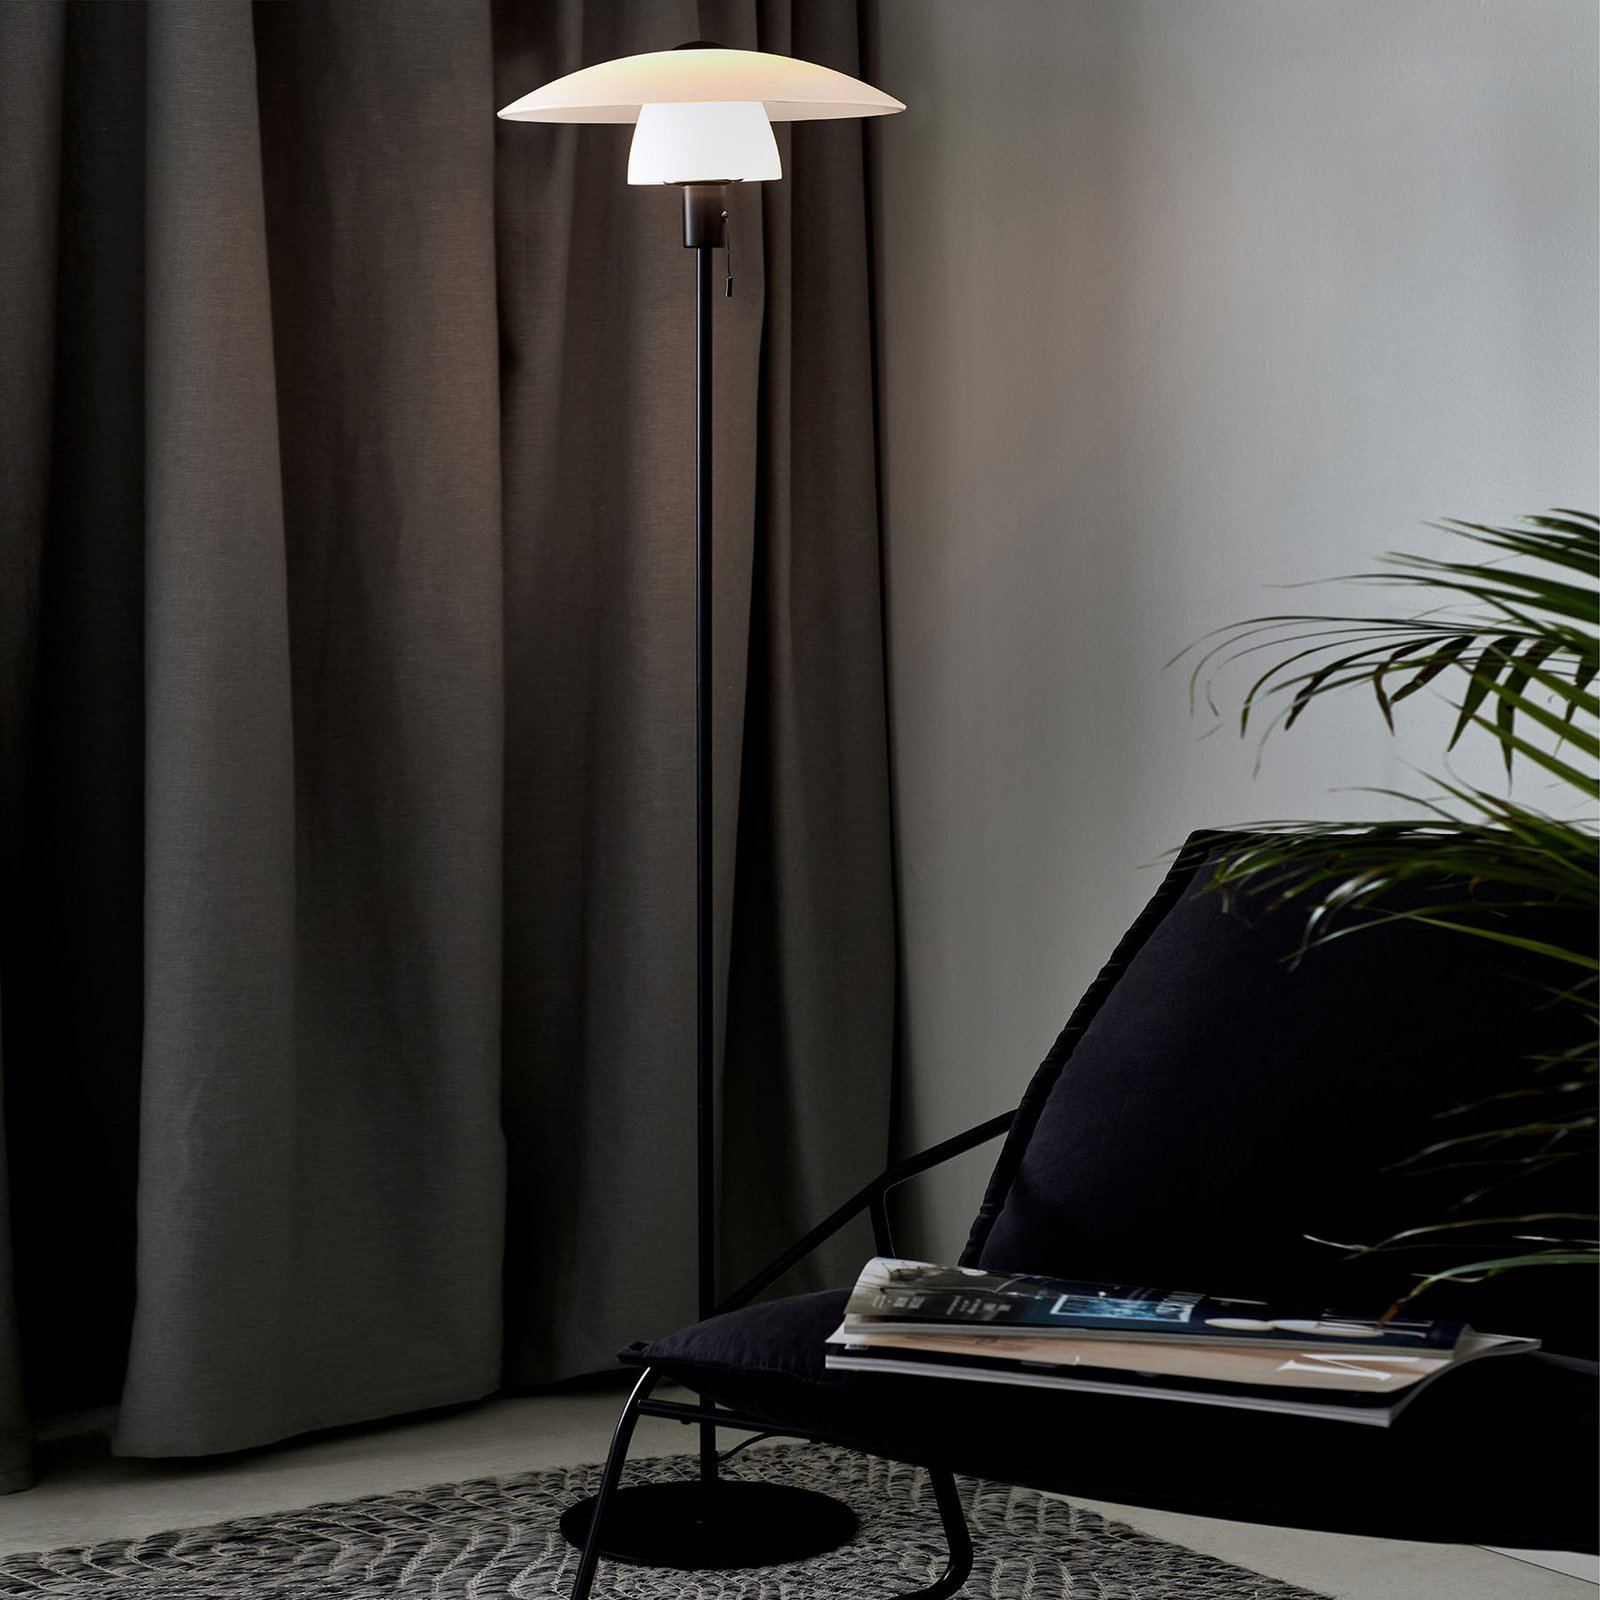 Gulvlampe Verona, svart stamme, opal skjerm